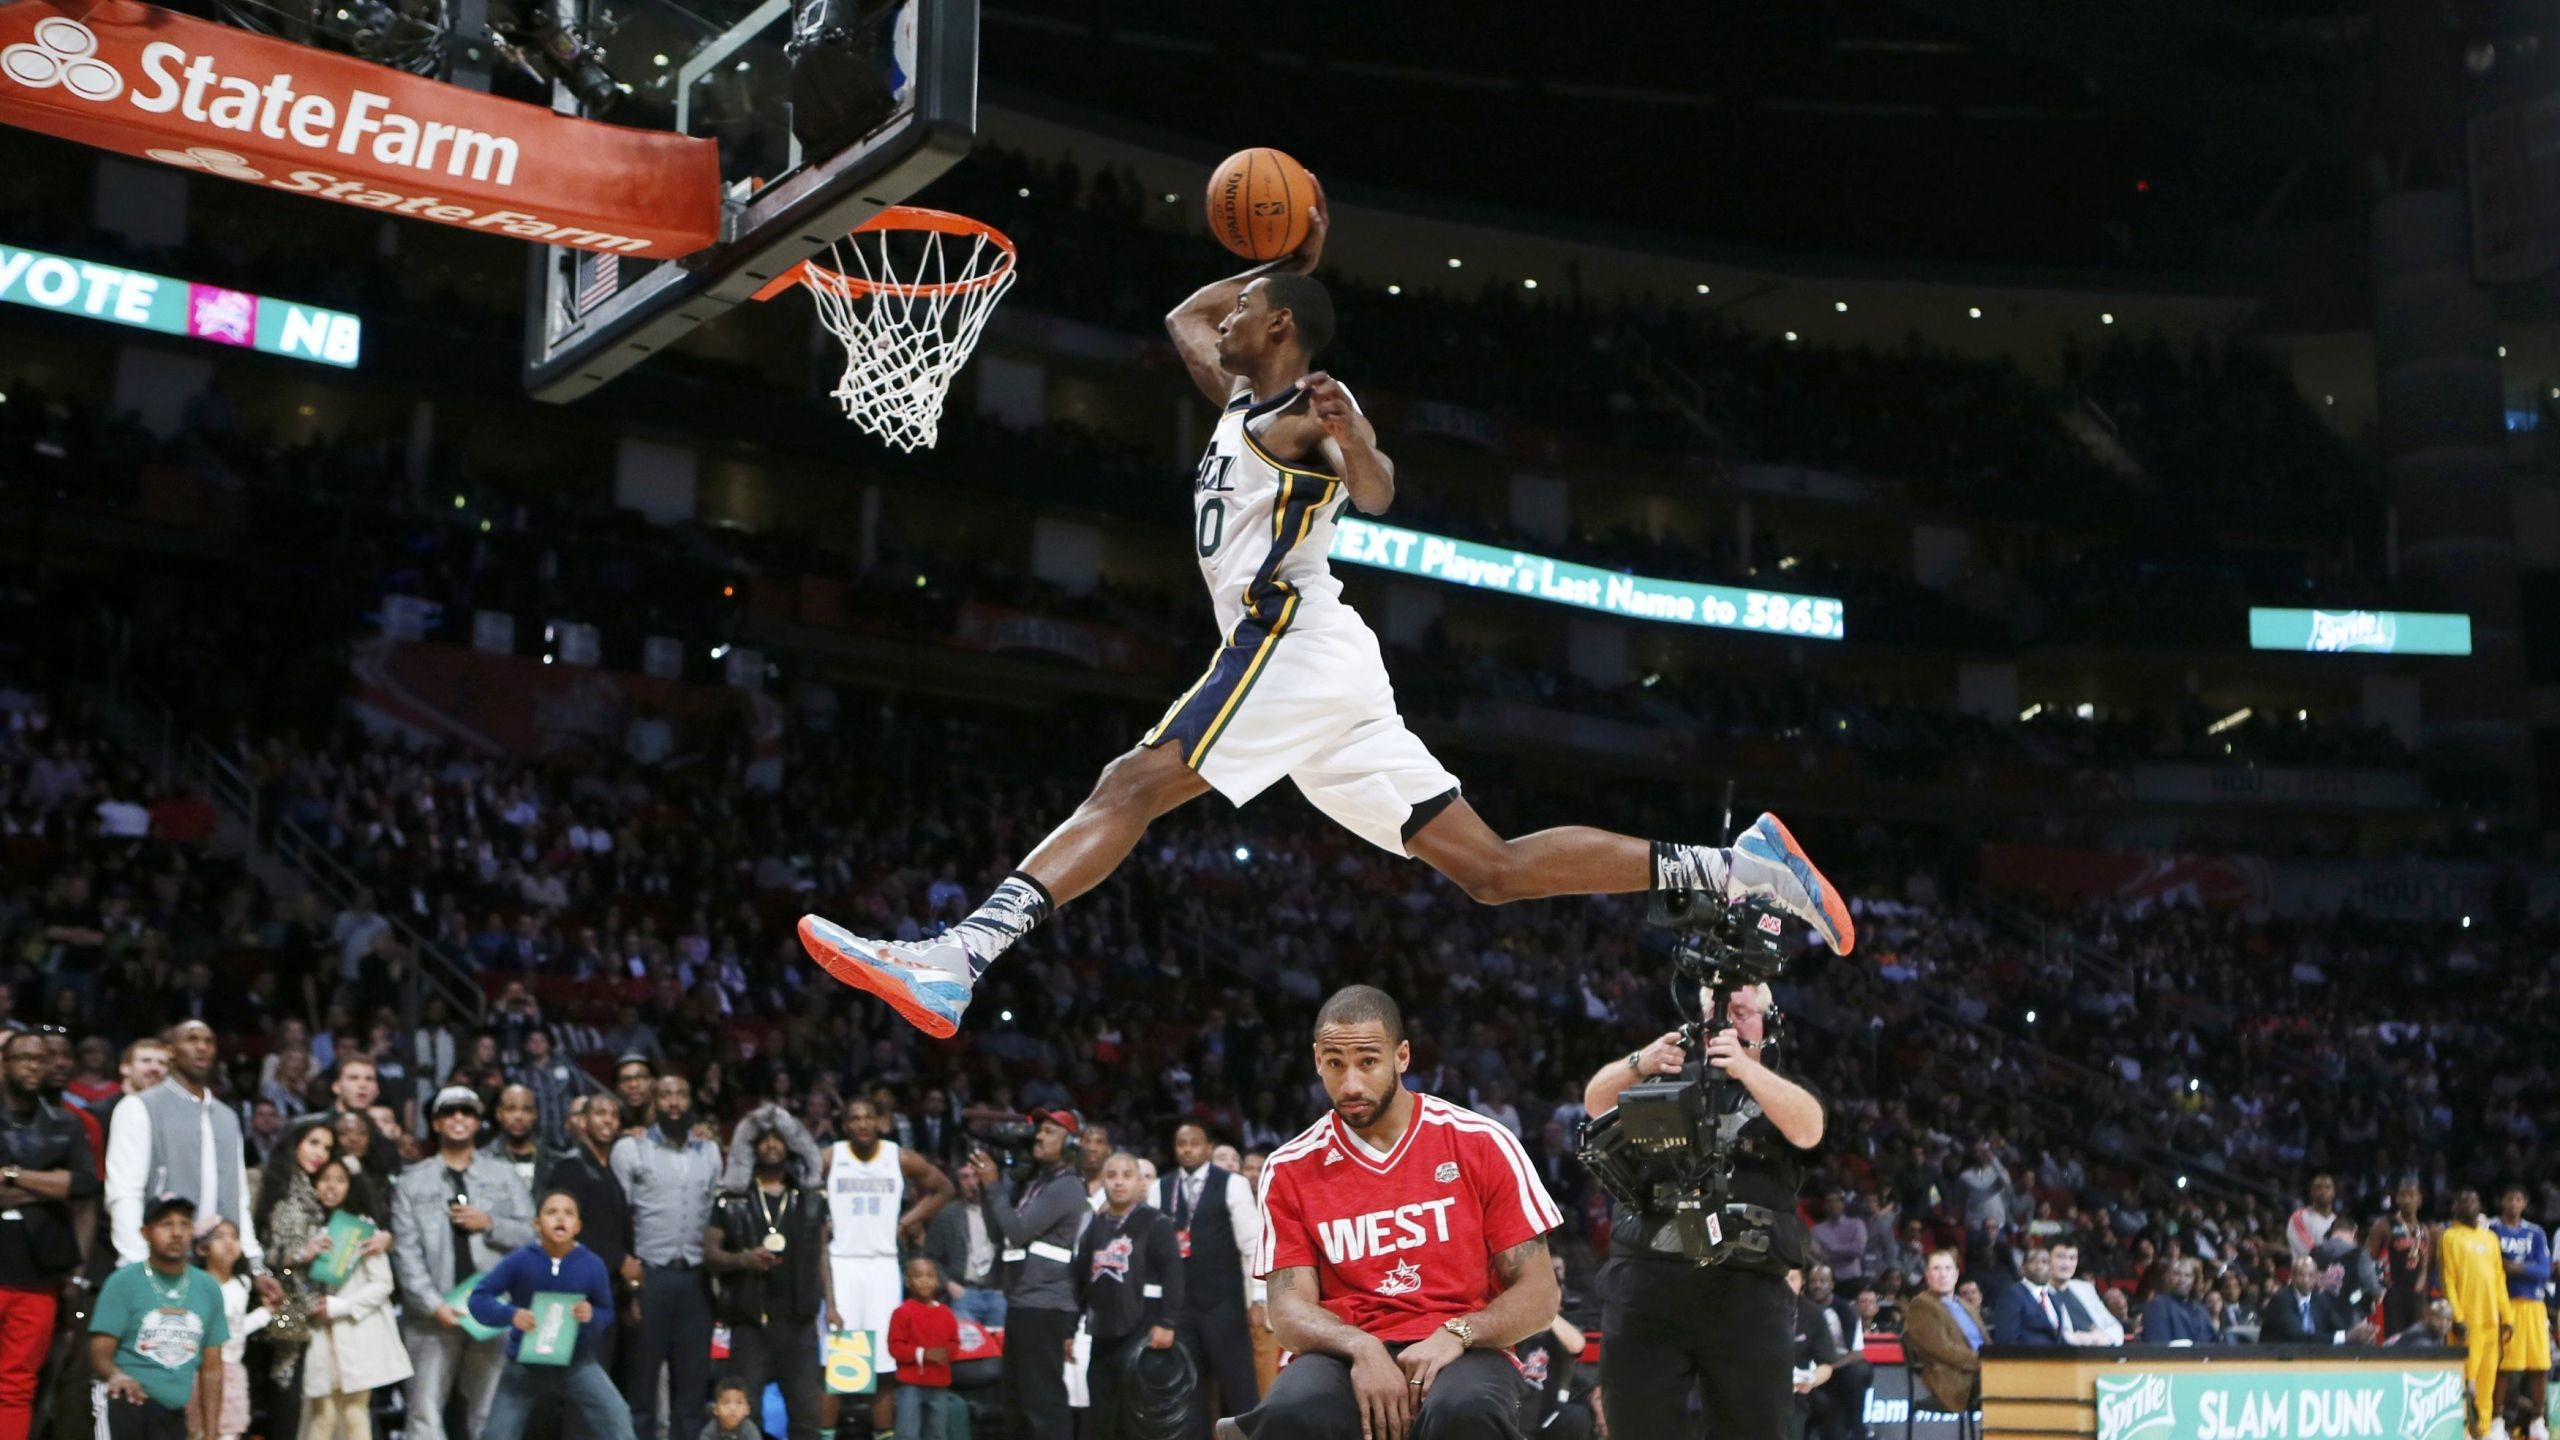 Download Wallpaper Jeremy evans, Basketball player, Nba .